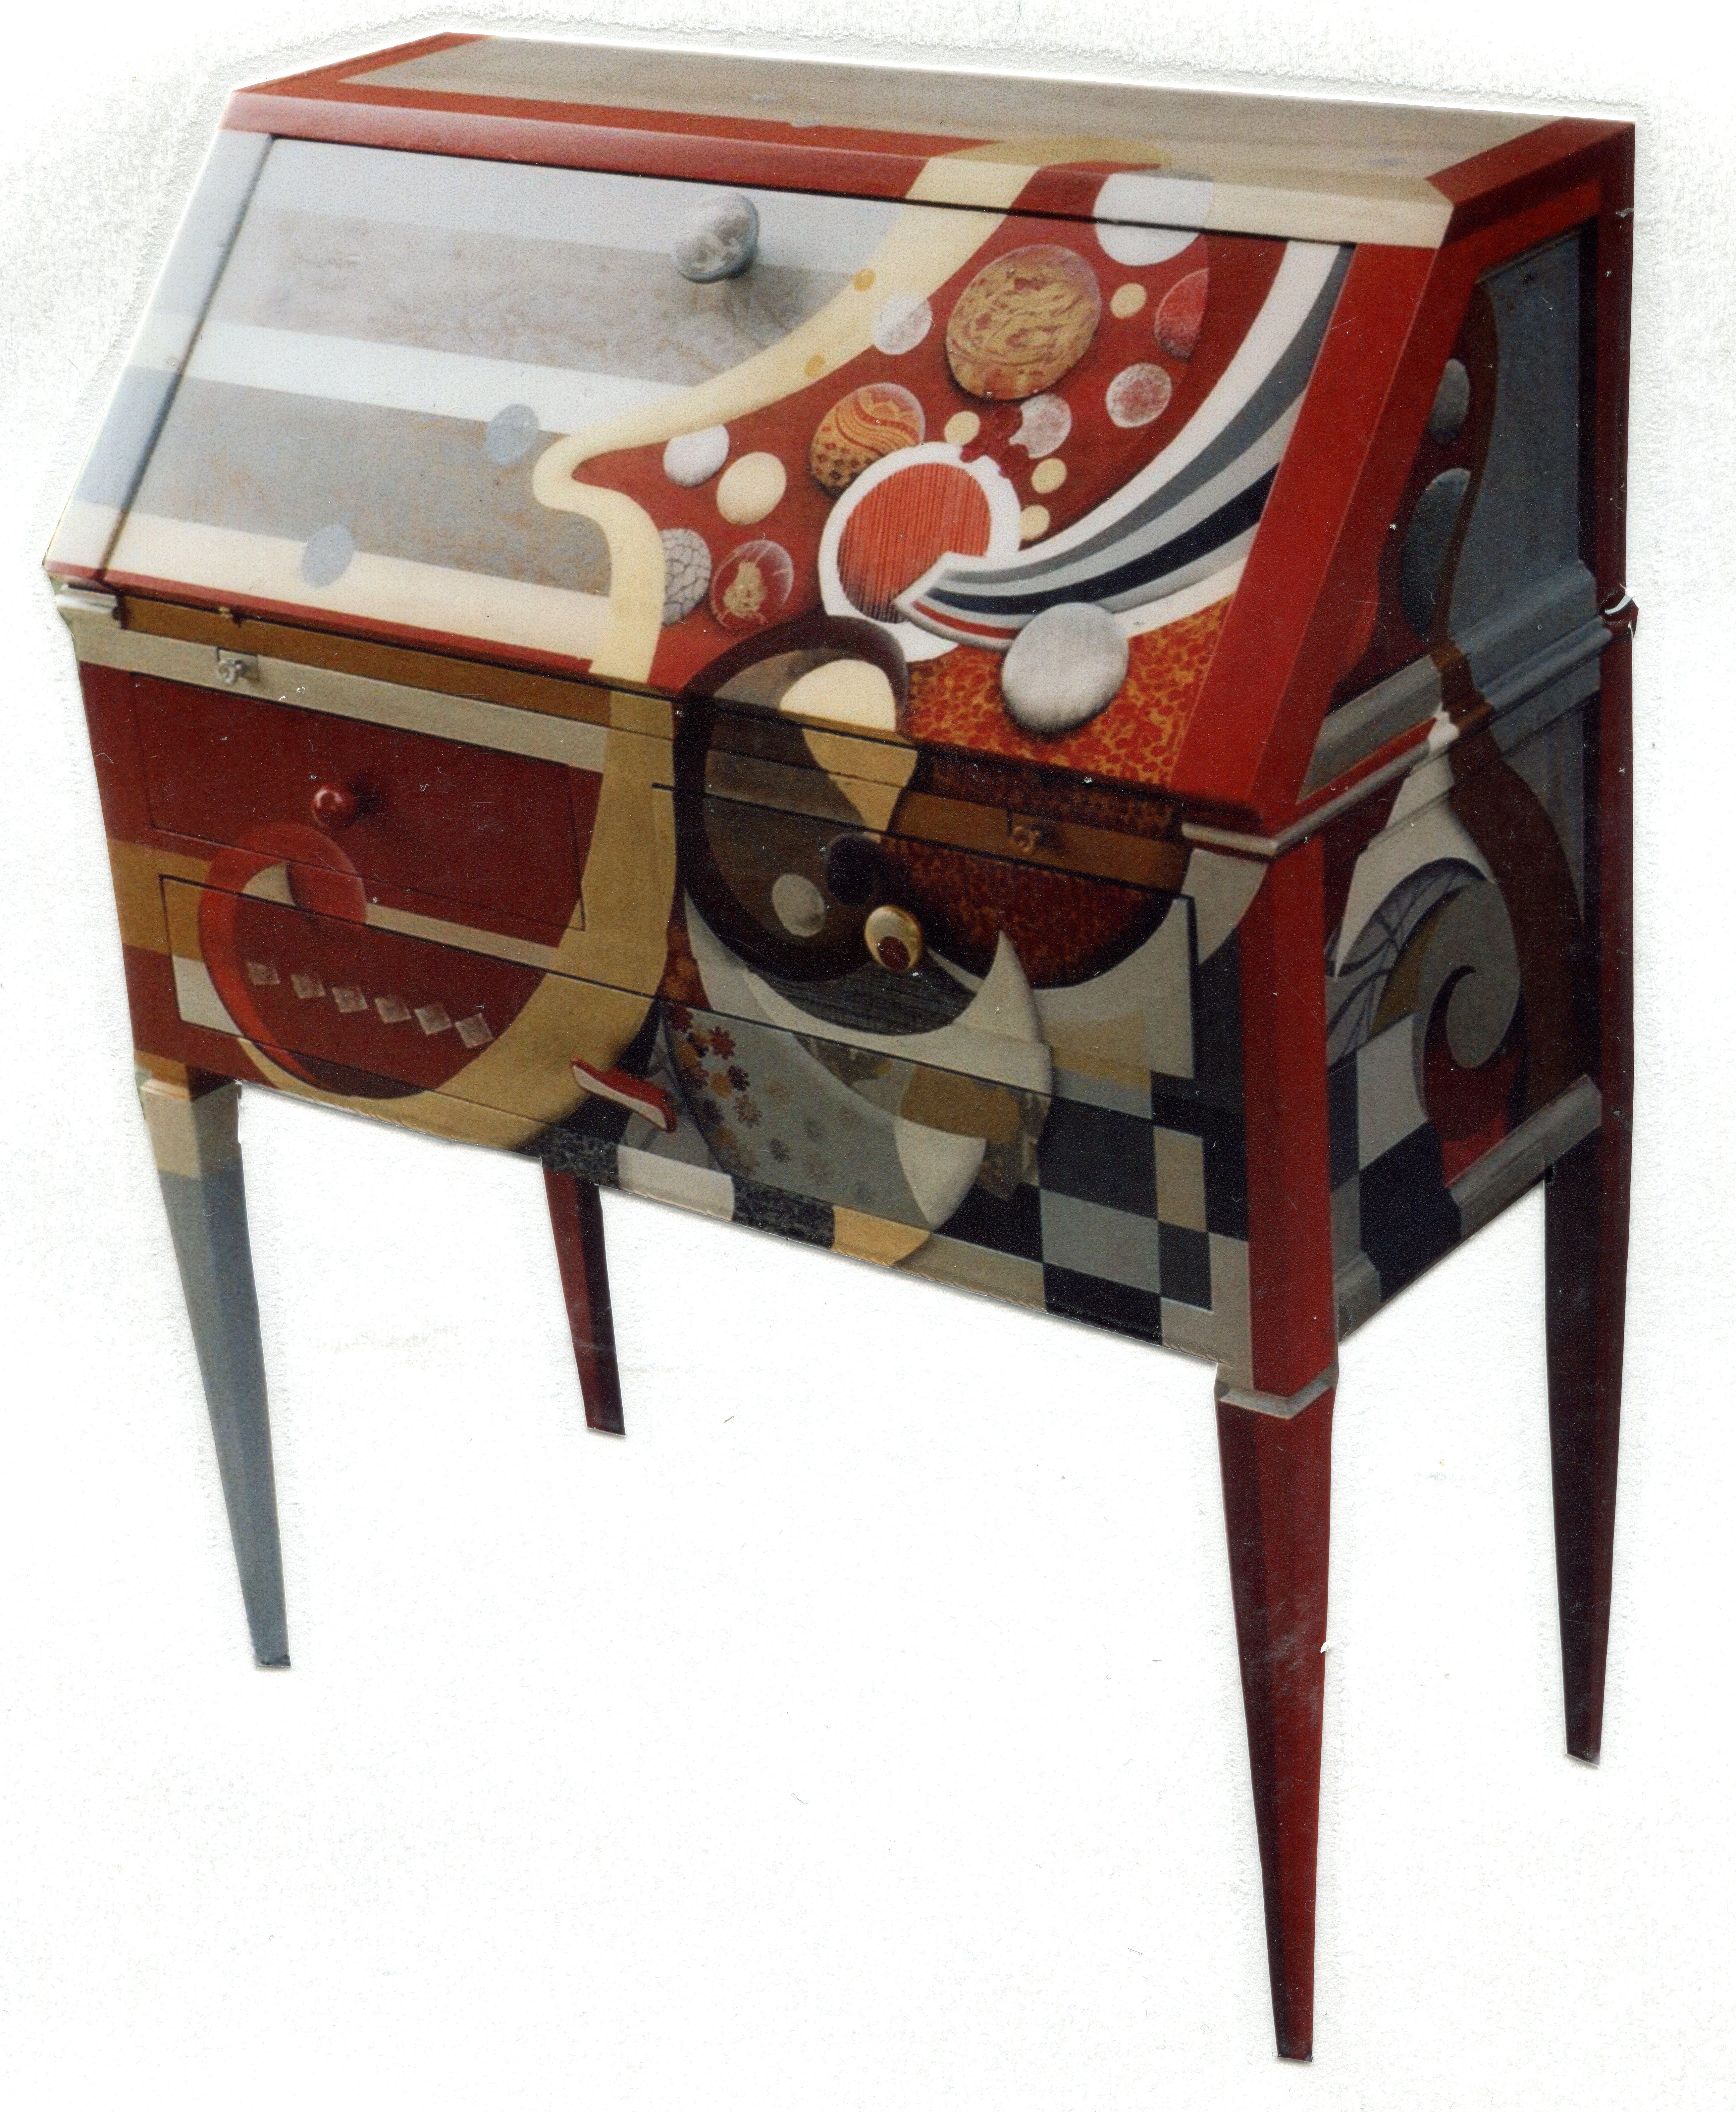 meubles peints chantal bonnefoy. Black Bedroom Furniture Sets. Home Design Ideas